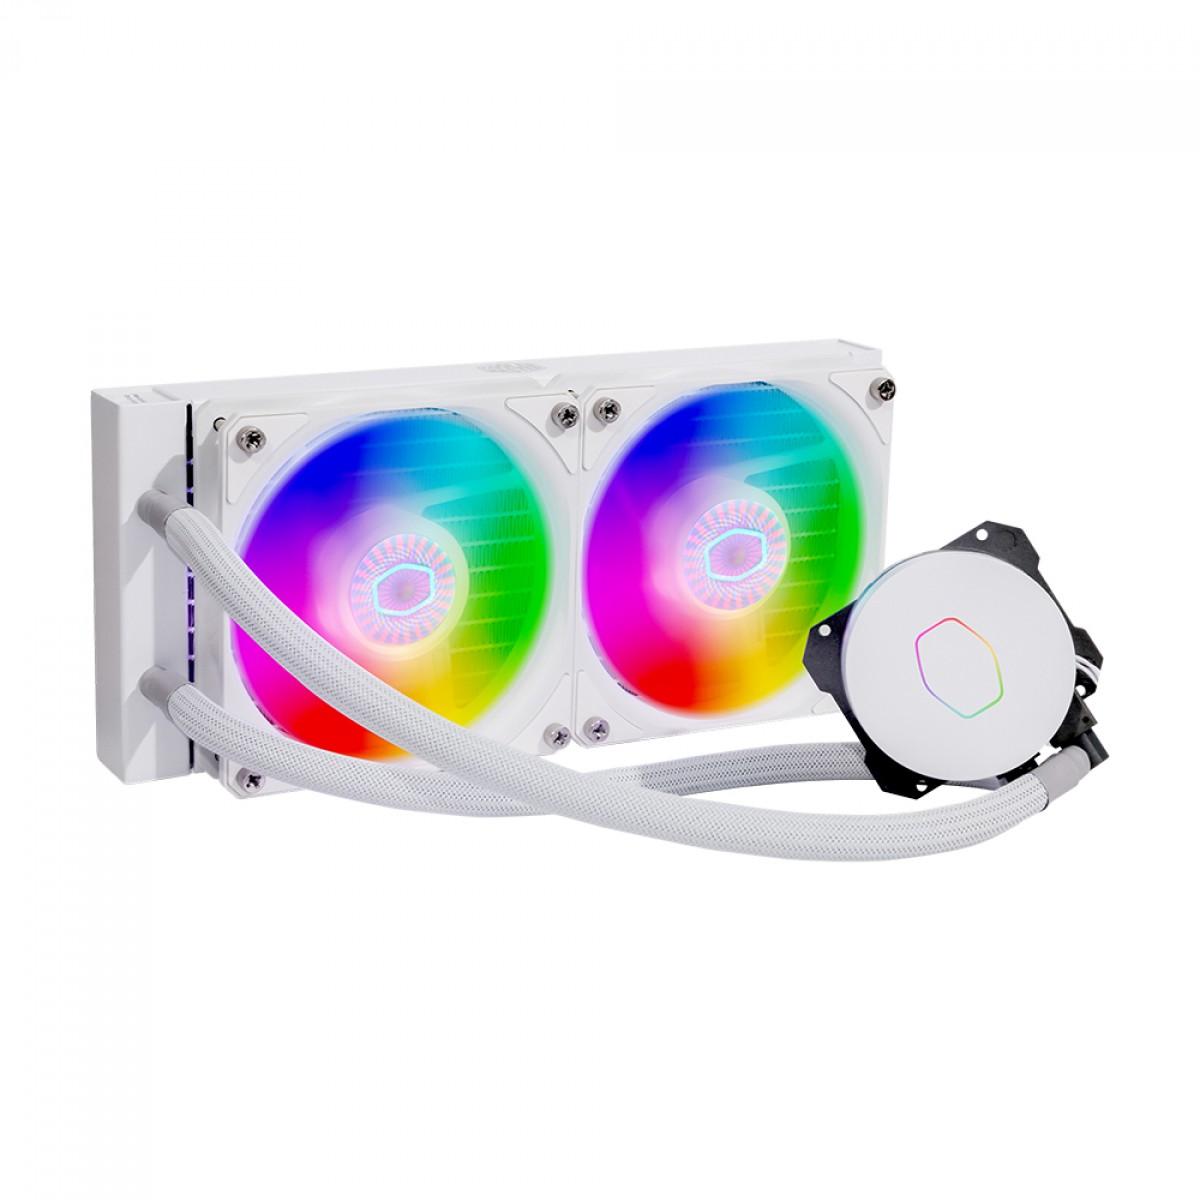 Water Cooler Cooler Master MasterLiquid ML240L, ARGB, White, 240mm, Intel-AMD, MLW-D24M-A18PW-RW